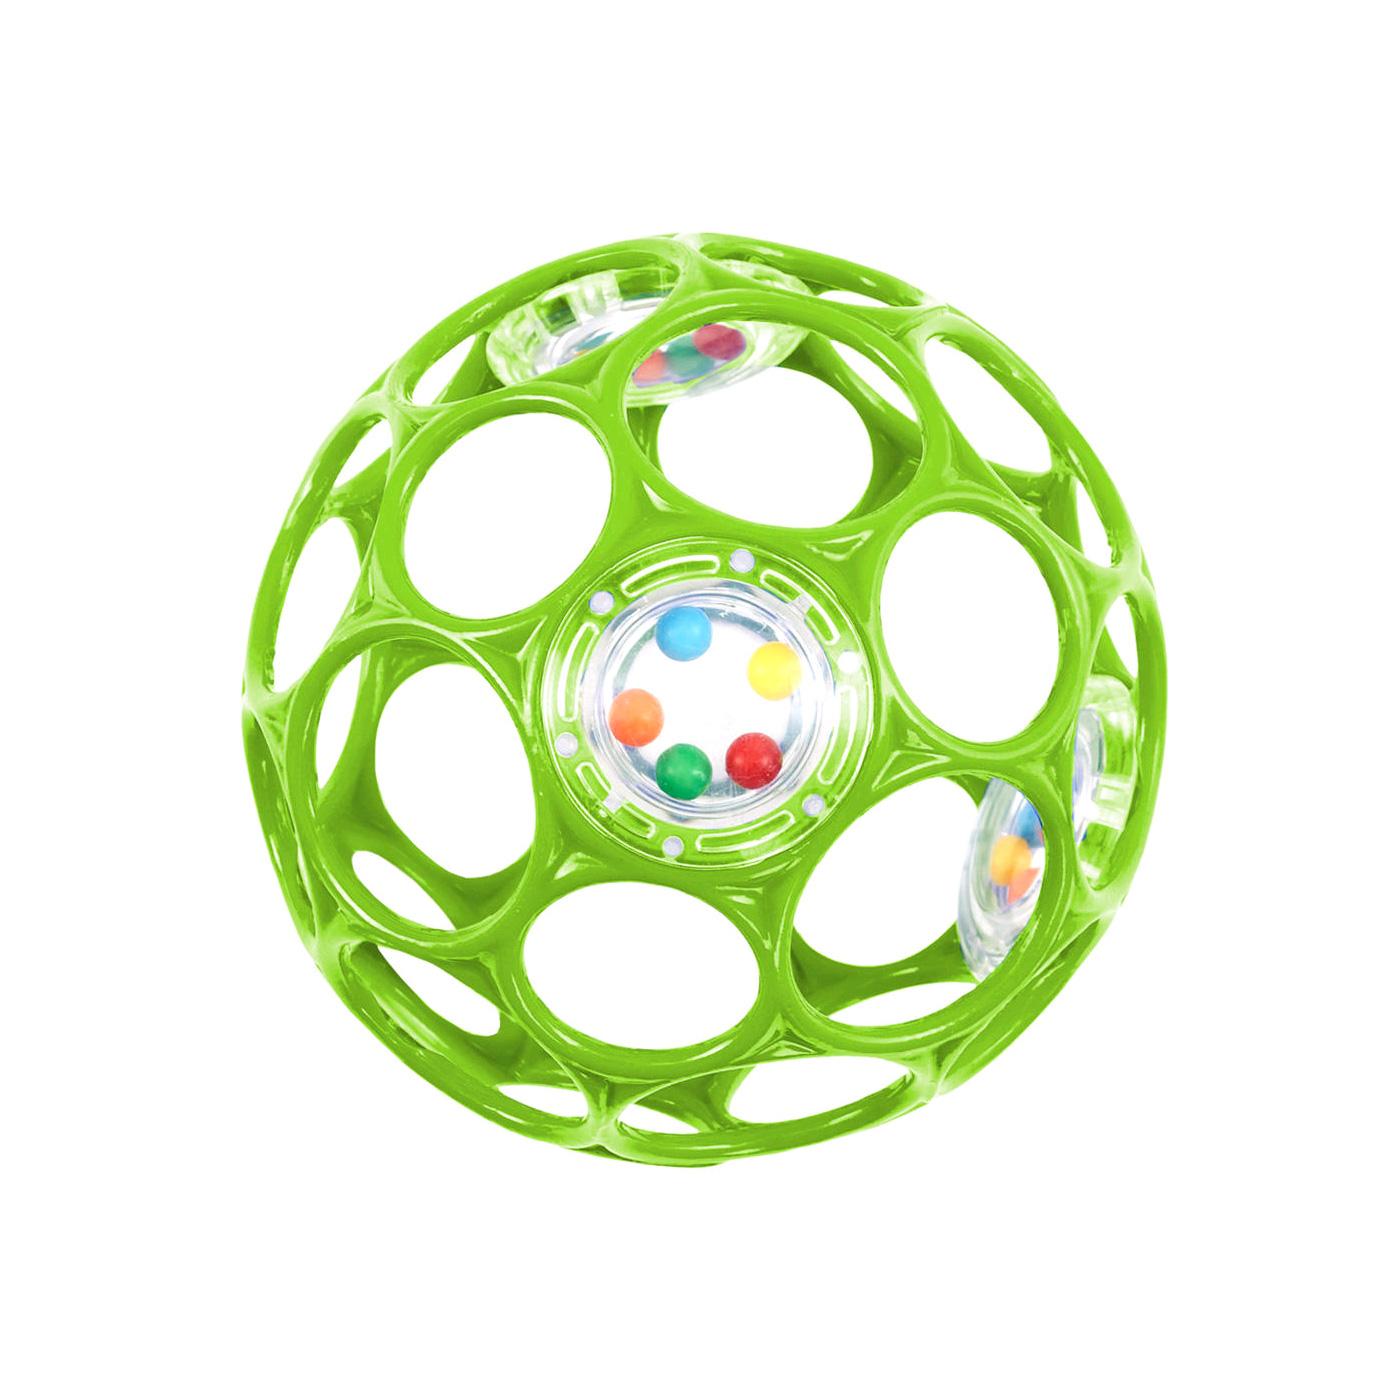 Oball Rassel - 10 cm - Grün